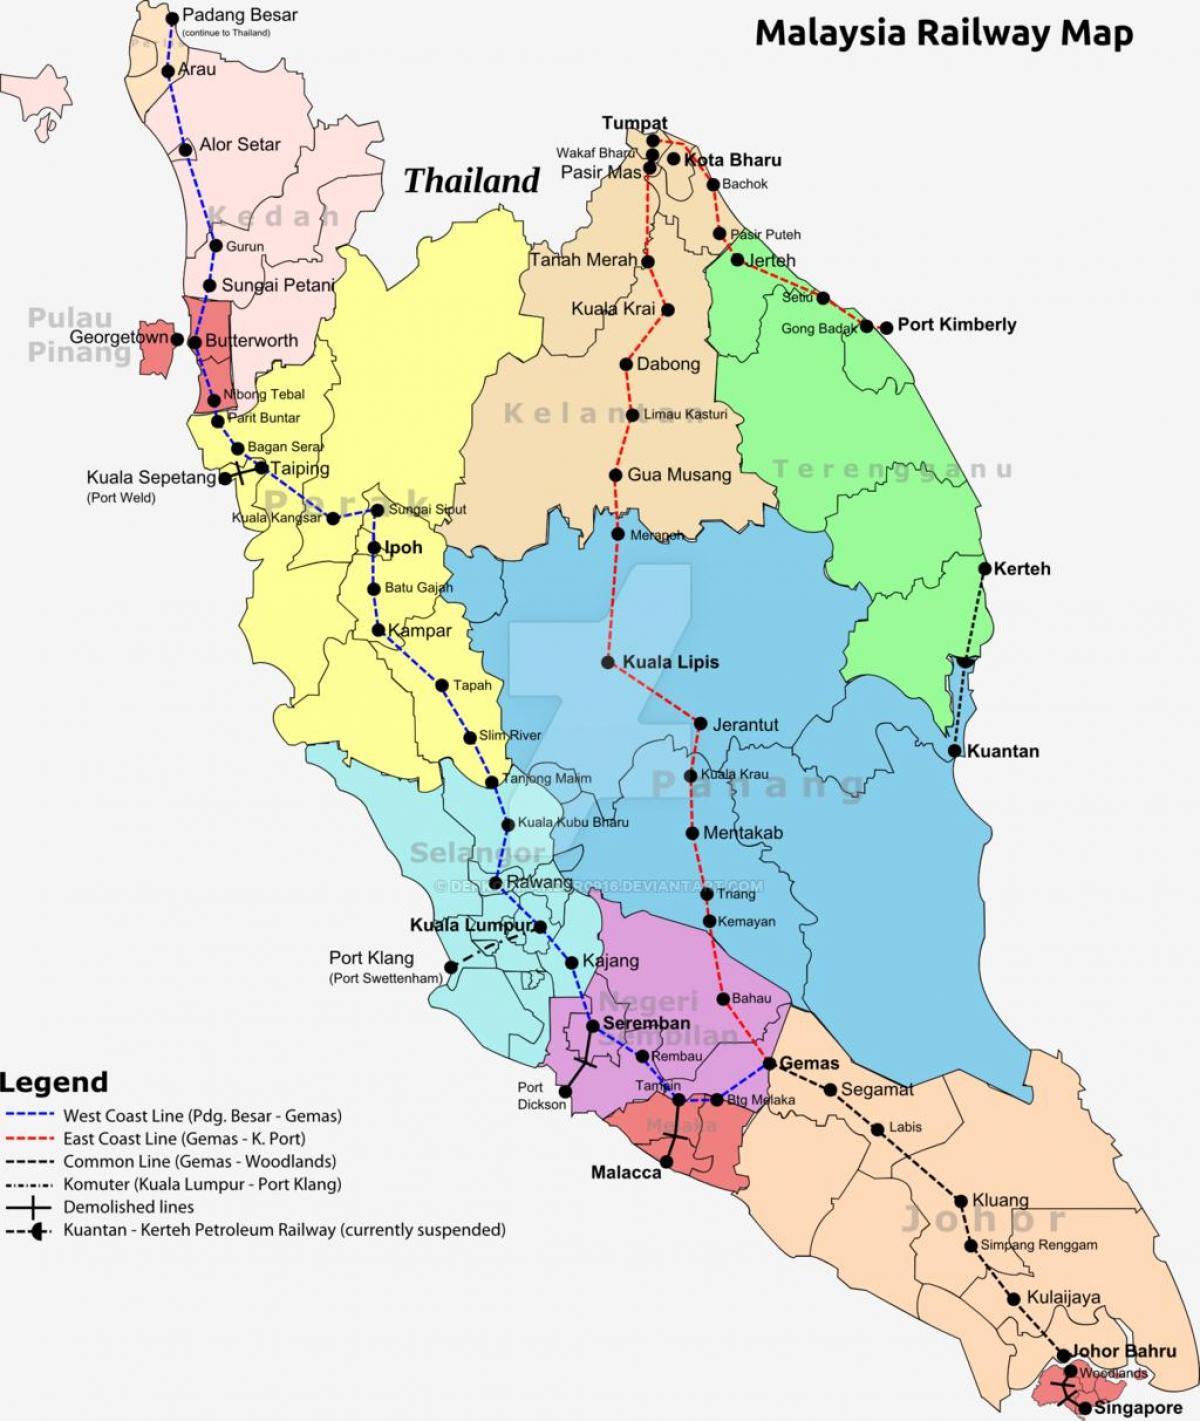 Map Of Asia Malaysia.Malaysia Railway Map Train Map Of Malaysia South Eastern Asia Asia